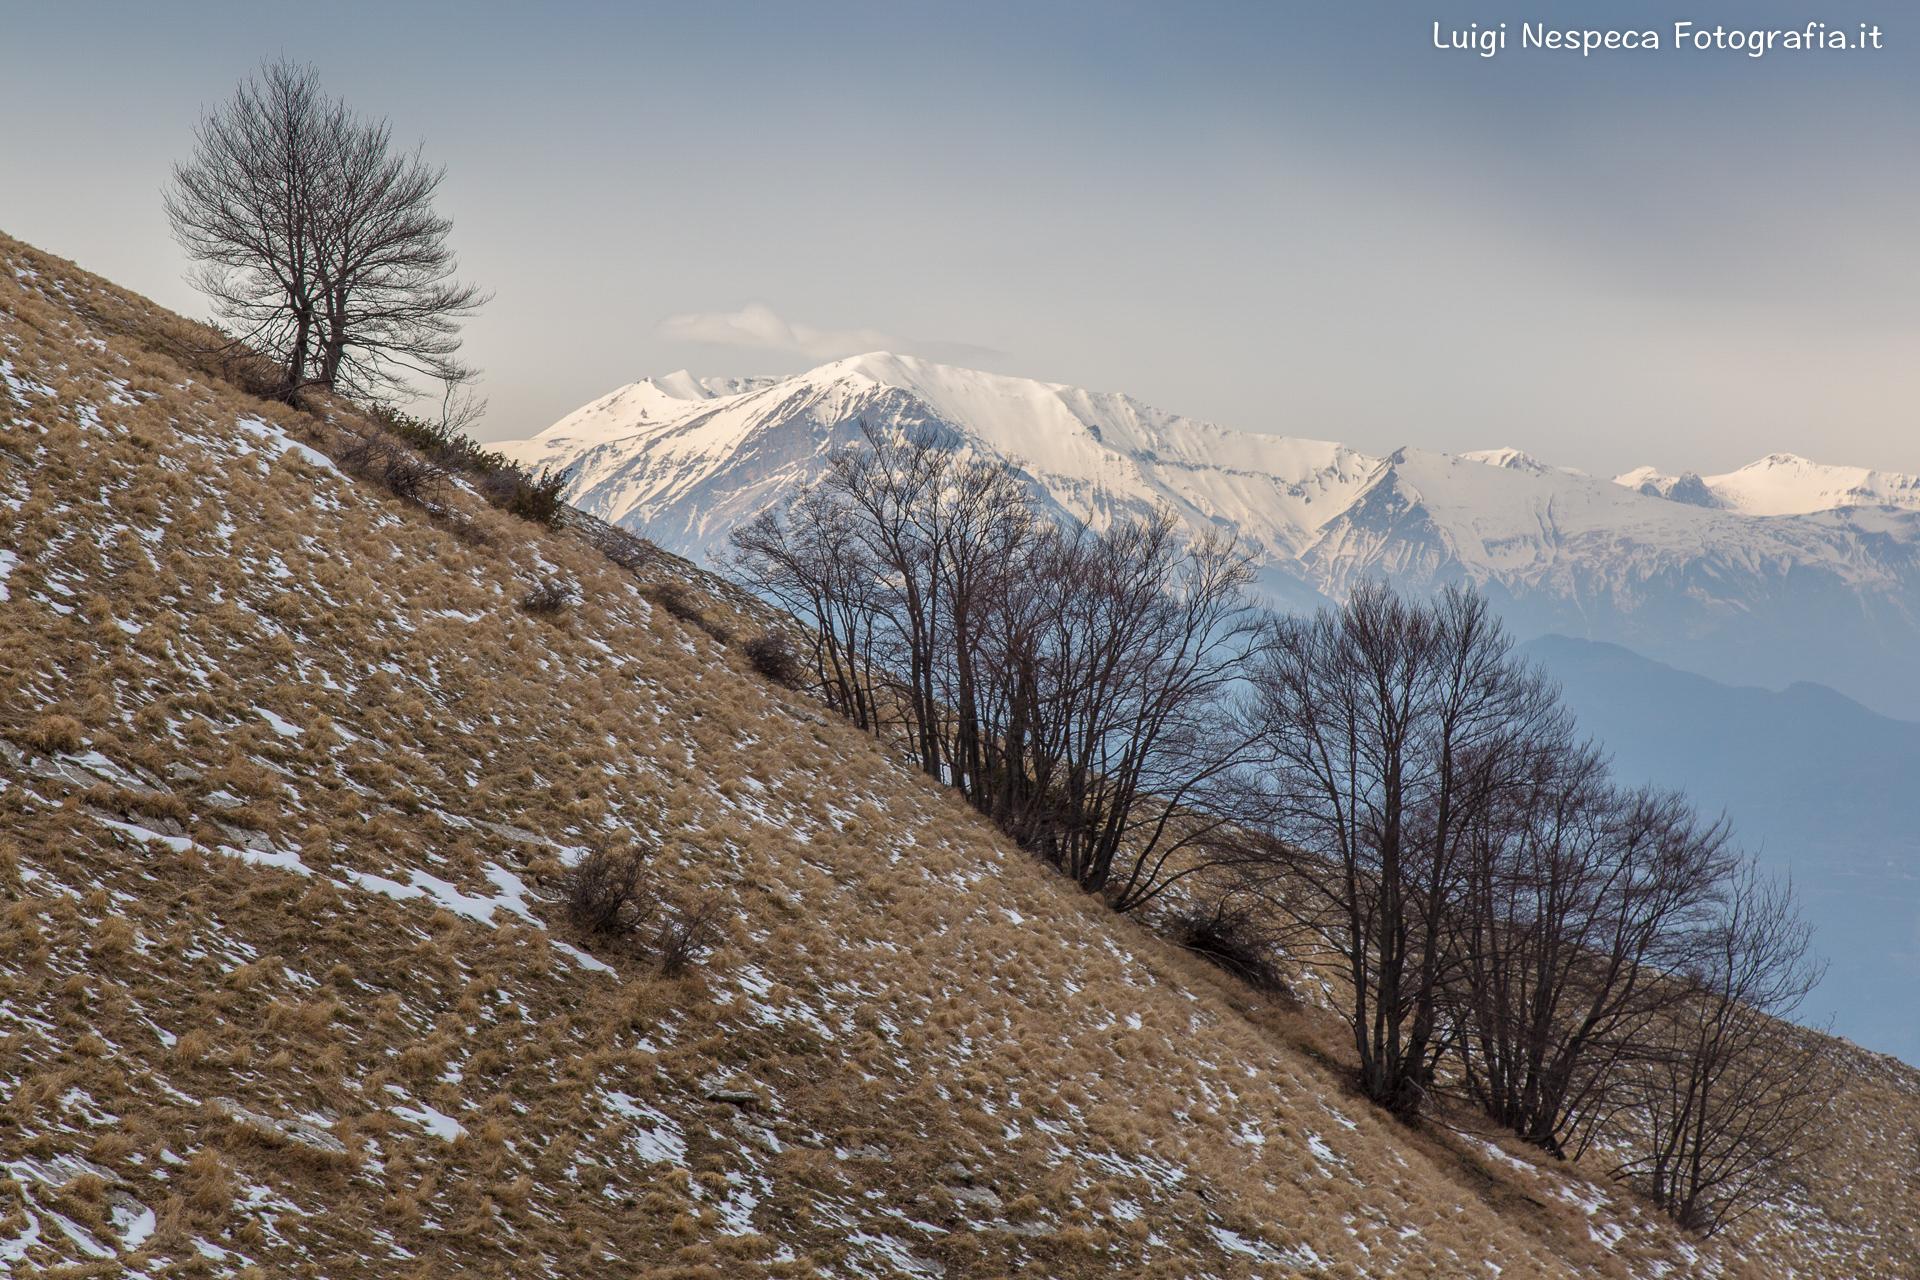 Il Monte Girella e i Sibillini - San Giacomo (TE)